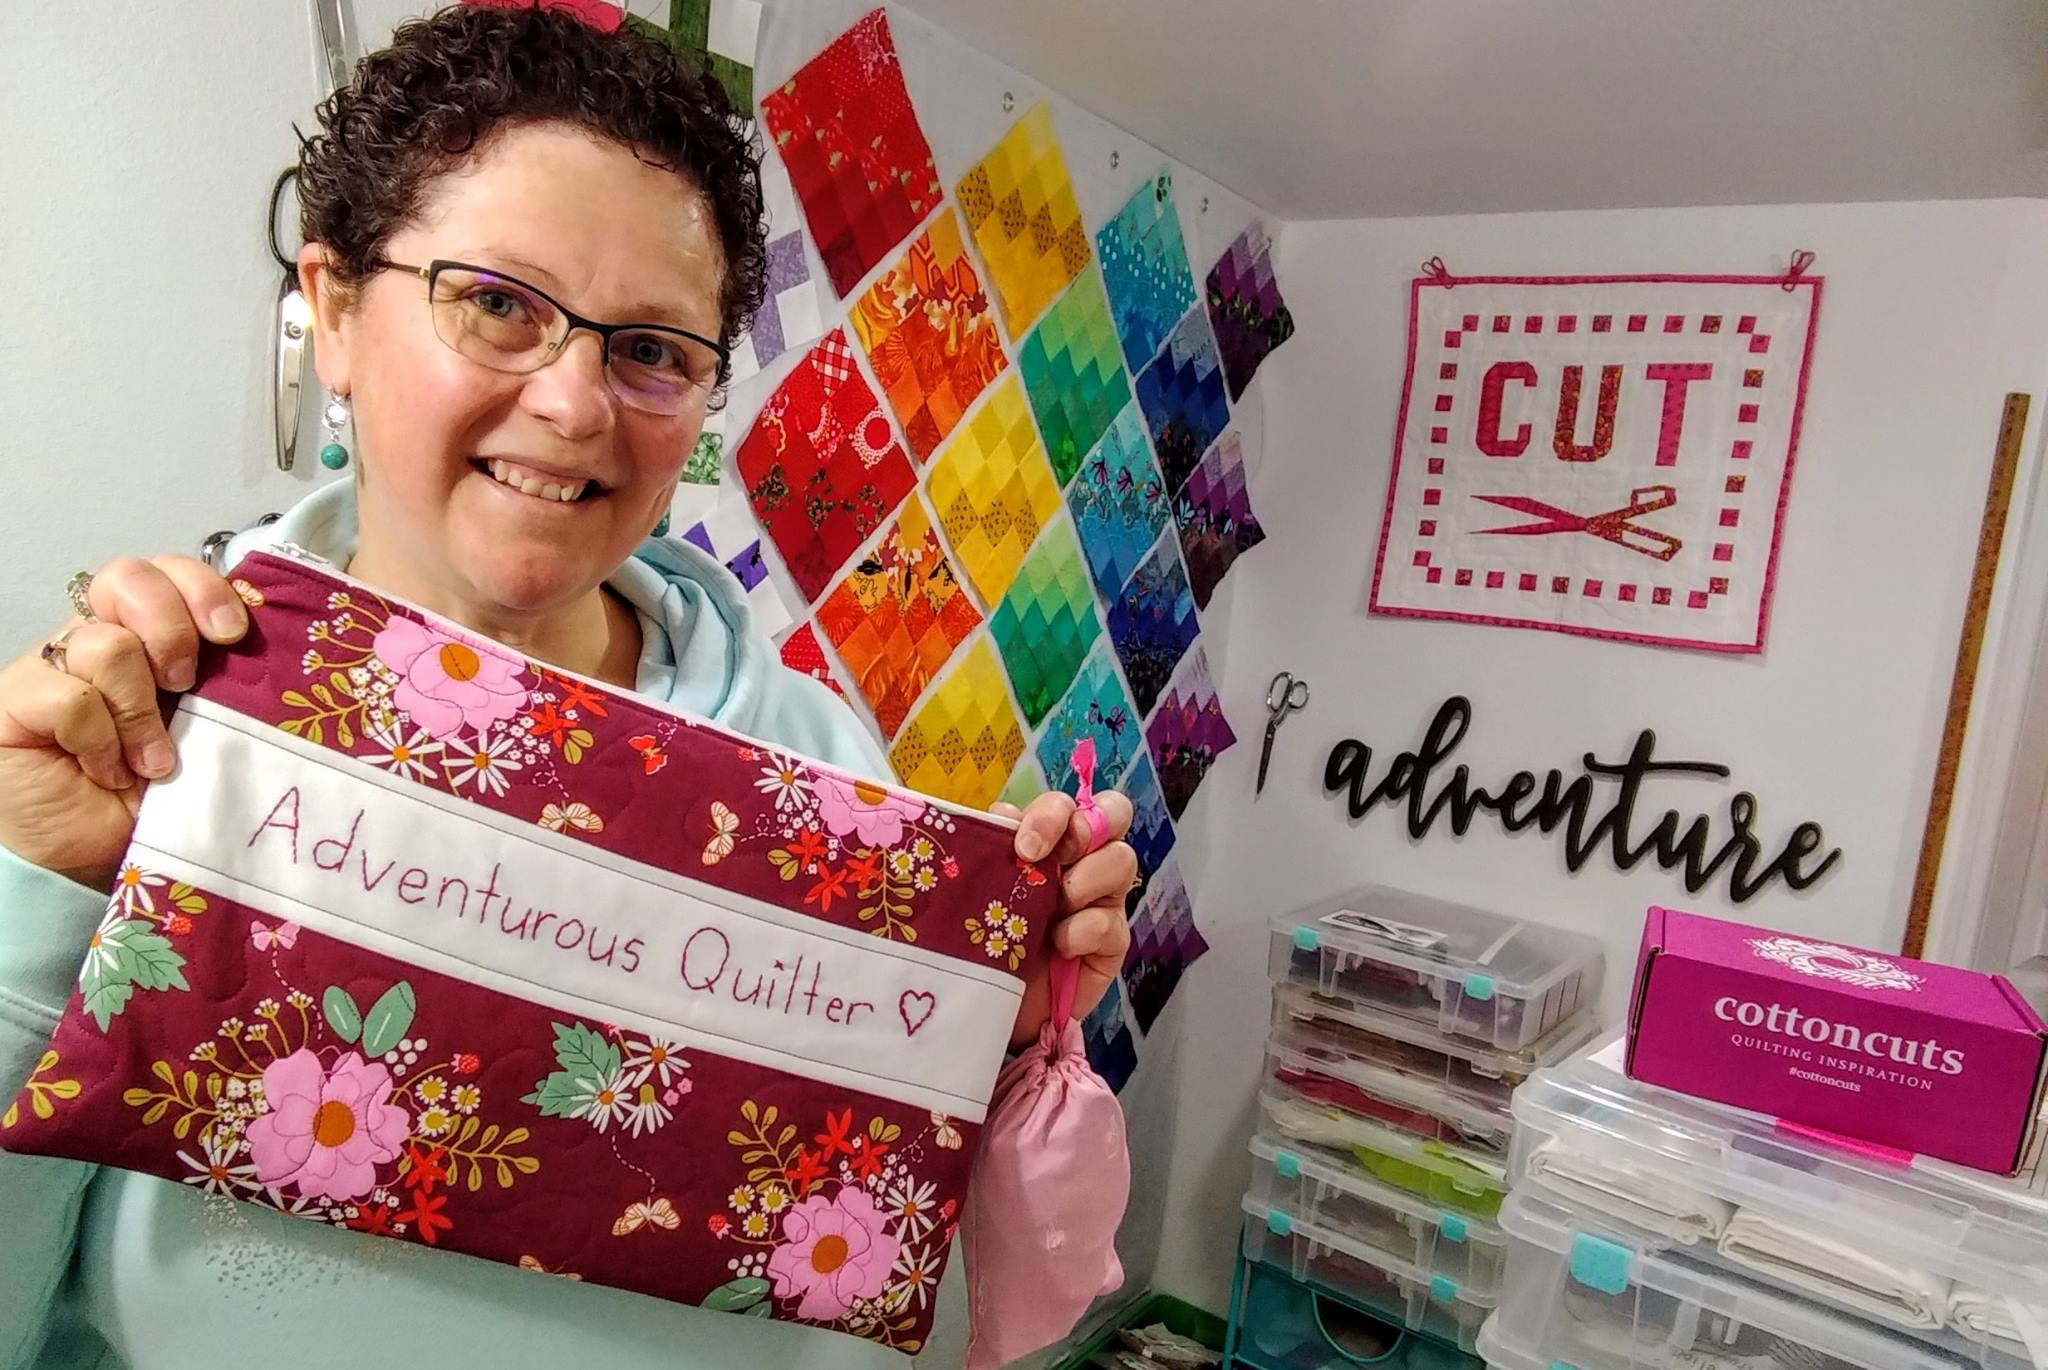 Marianne Jeffrey Adventurous Quilter Cotton Cuts Classic Box Brand Ambassador.jpg